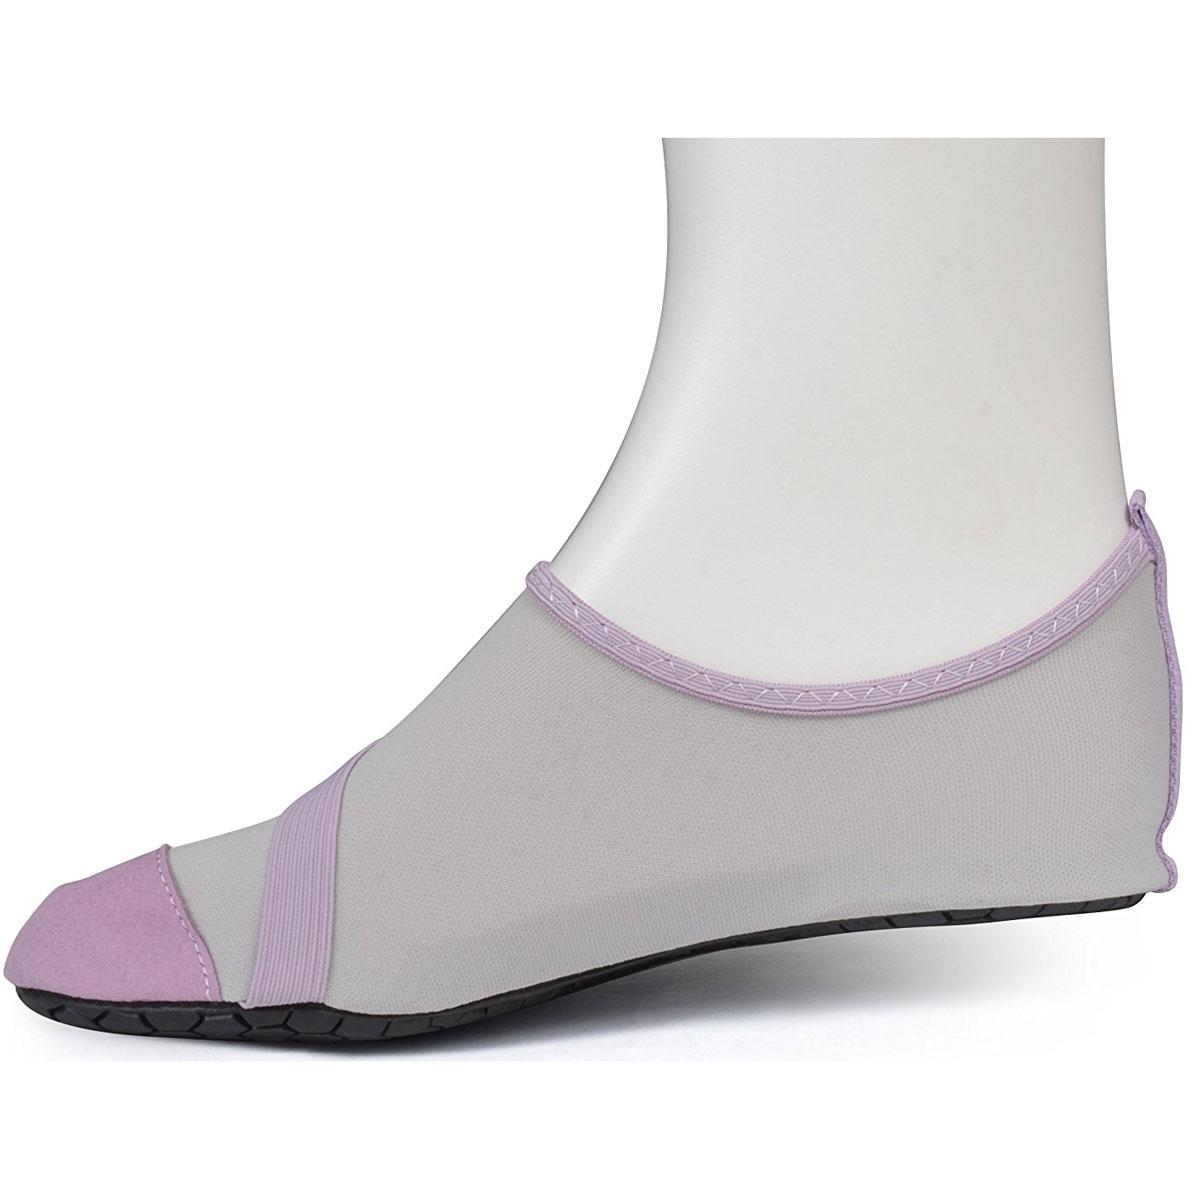 FitKicks-Women-039-s-Non-Slip-Sole-Active-Footwear thumbnail 26